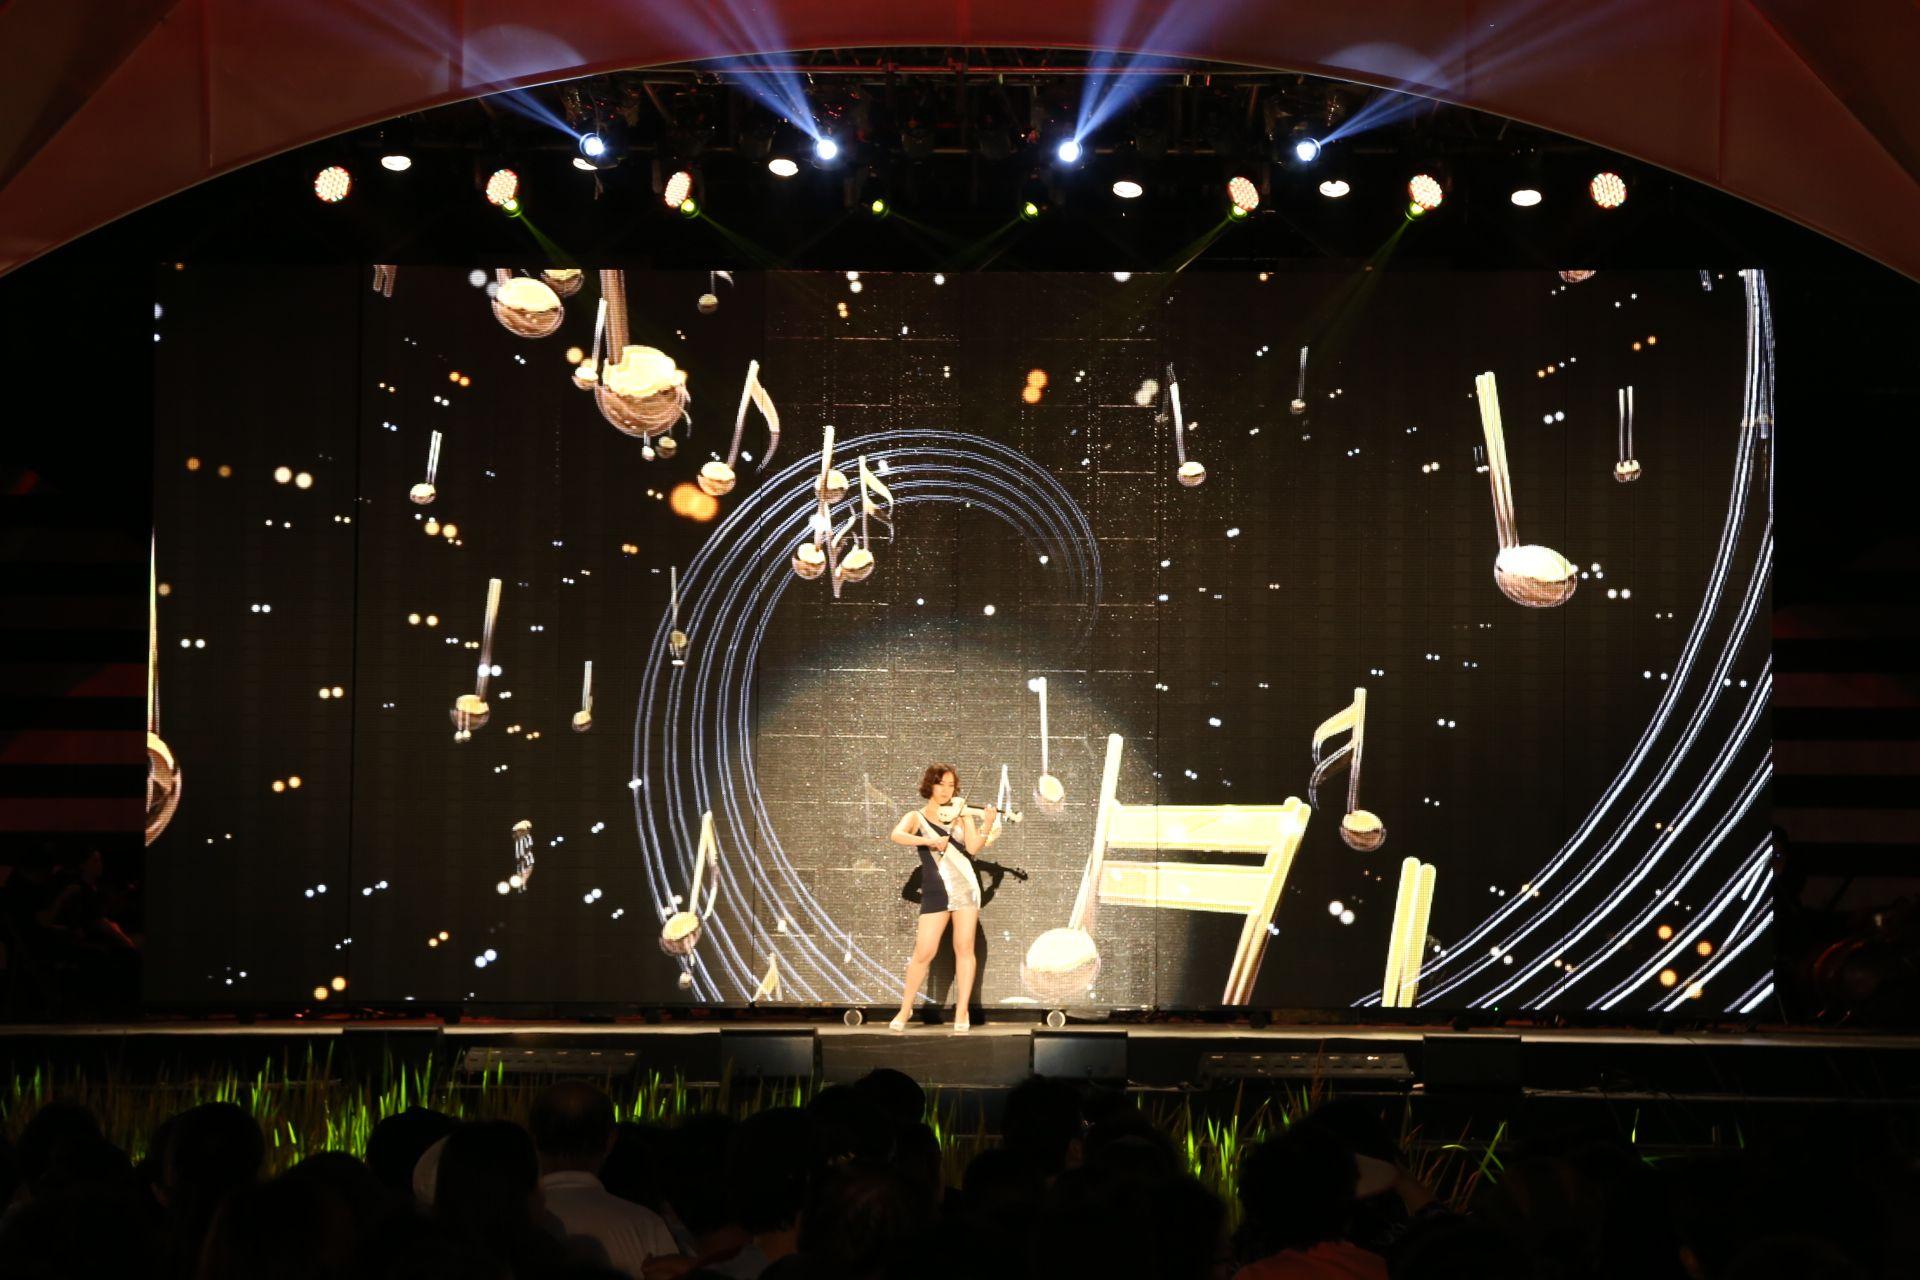 DMZ 평화콘서트 -김수정 메조소프라노(DMZ Peace Concert - Kim soojung mezzo-soprano)출연  2014년 8월15일 광복절에 임진각 평화누리 음악의 언덕에서 한국입양어린이 합창단장이신 메조소프라노 김수정님과 한국입양어린이합창단이 출연. .. 또한 제가 잘아는 쟈스민도 출연하고요,,,그 오페라 신데렐라 - 메조소프라노 김수정(Opera La Cenerentola-MezzoSprano Kim Soo-Jung) http://www.youtube.com/watch?v=F2weY1OLvh8   전자바이올린의 자스민님^ http://www.youtube.com/watch?v=nSQ0DG4x_tM  장소 임진각 평화누리 음악의 언덕 http://en.ggtour.or.kr/?lang=manual   free app. sasang diagnosis program. http://www.iwooridul.com/app-update